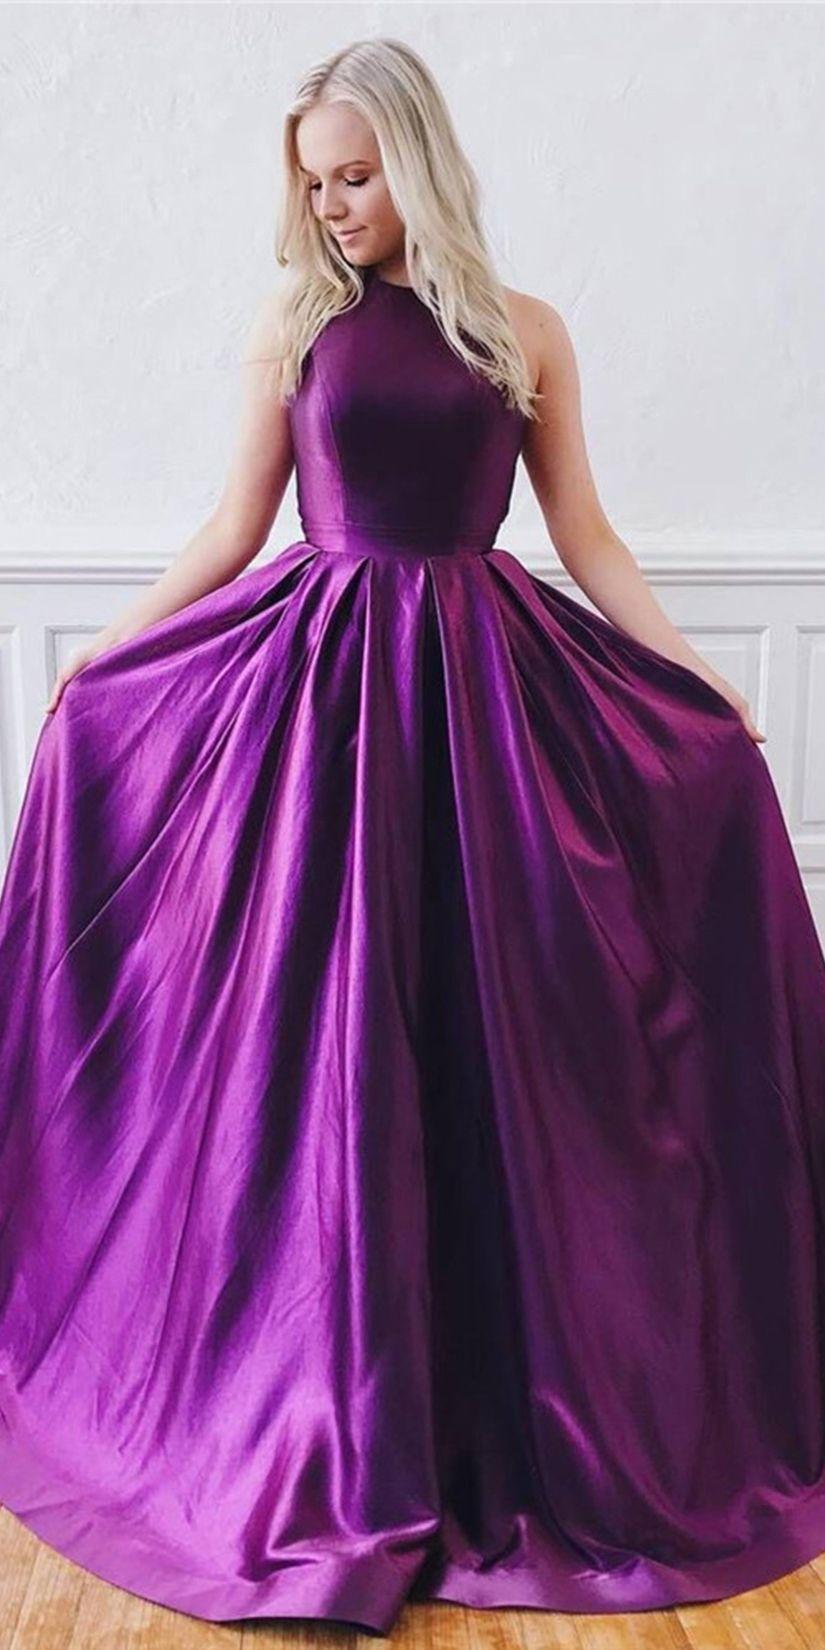 Unique Purple Satin Sleeveless Sweep Train Open Back Long Prom Dress Evening Dress Ohc405 Prom Dress With Train Prom Dresses Long Cheap Prom Dresses Long [ 1650 x 825 Pixel ]